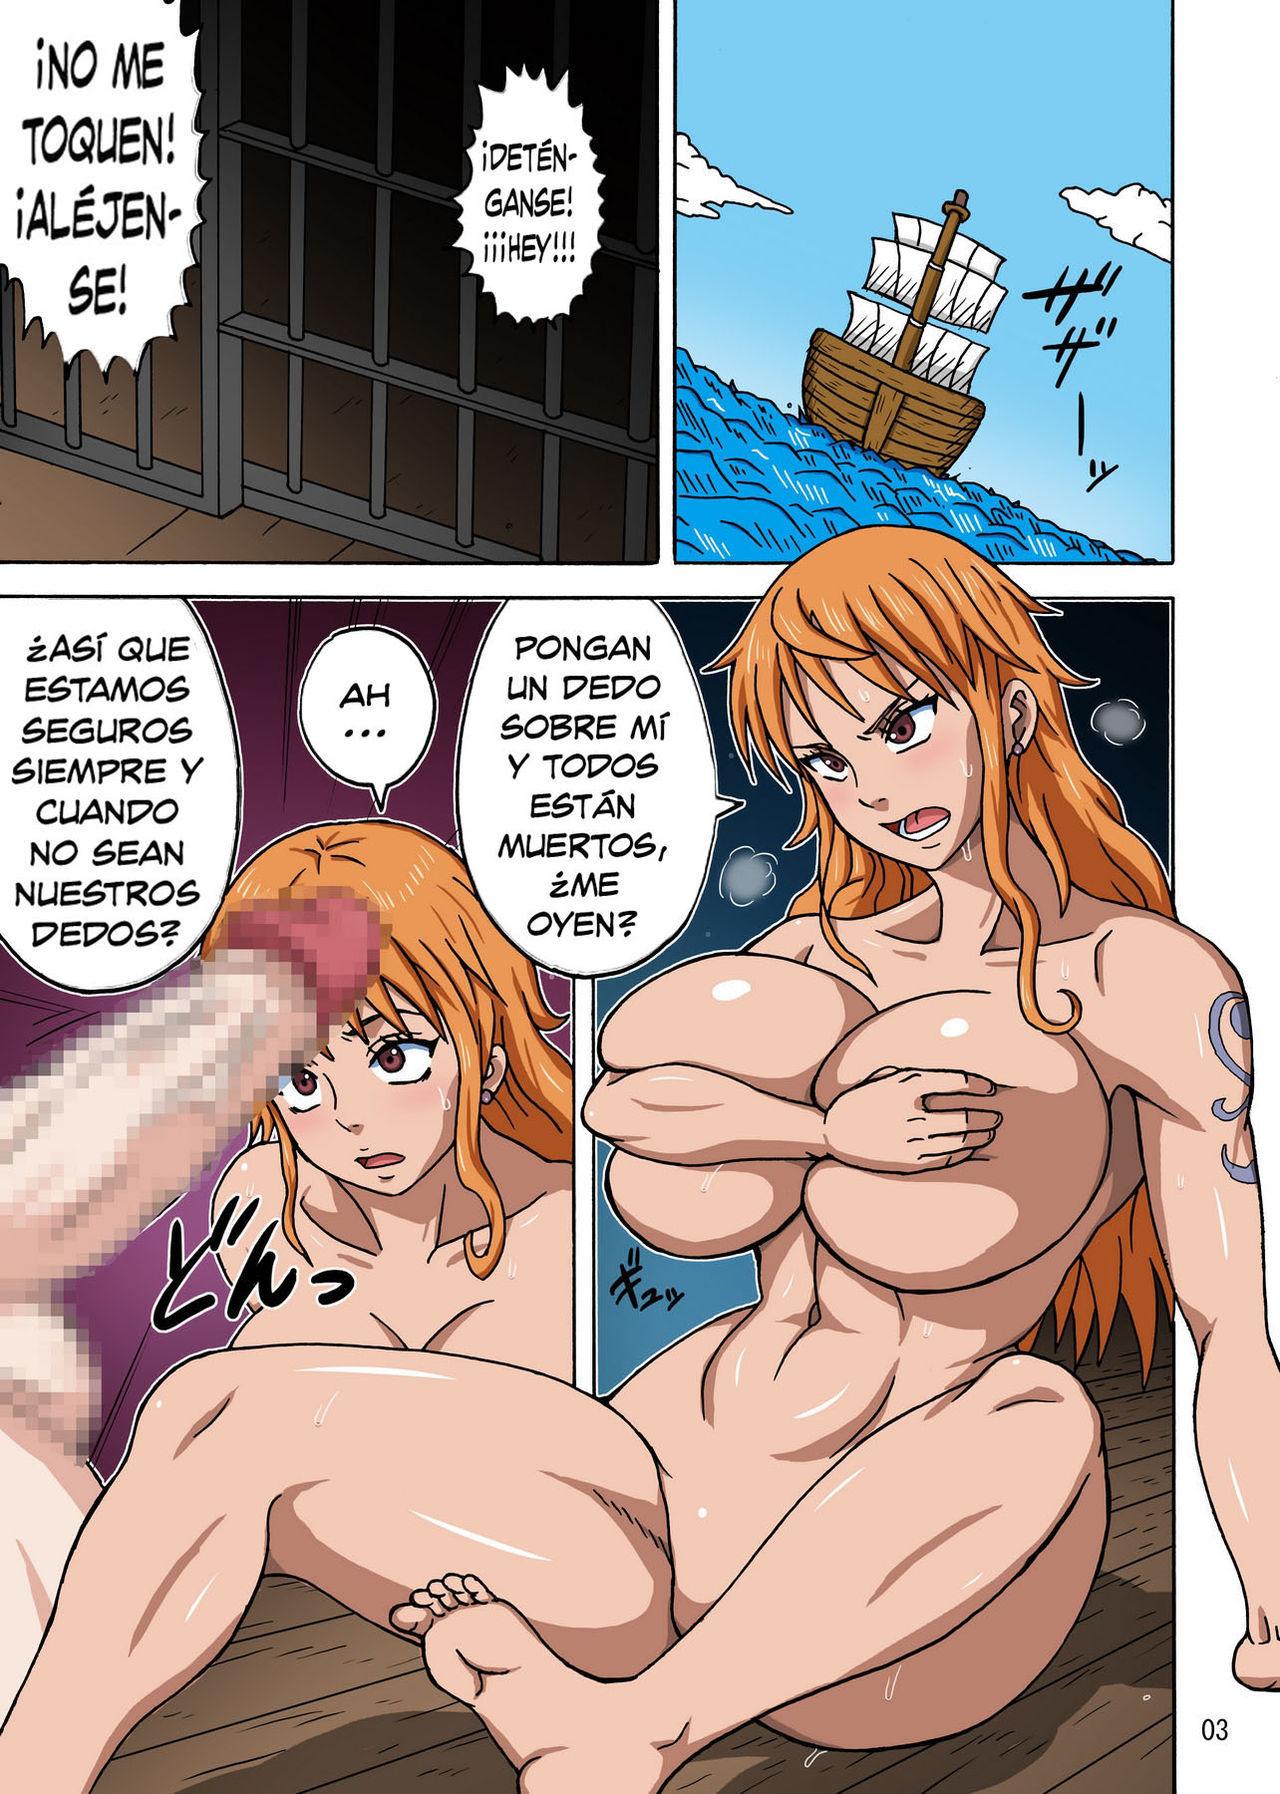 Nami-SAGA-2-One-Piece-02.jpg